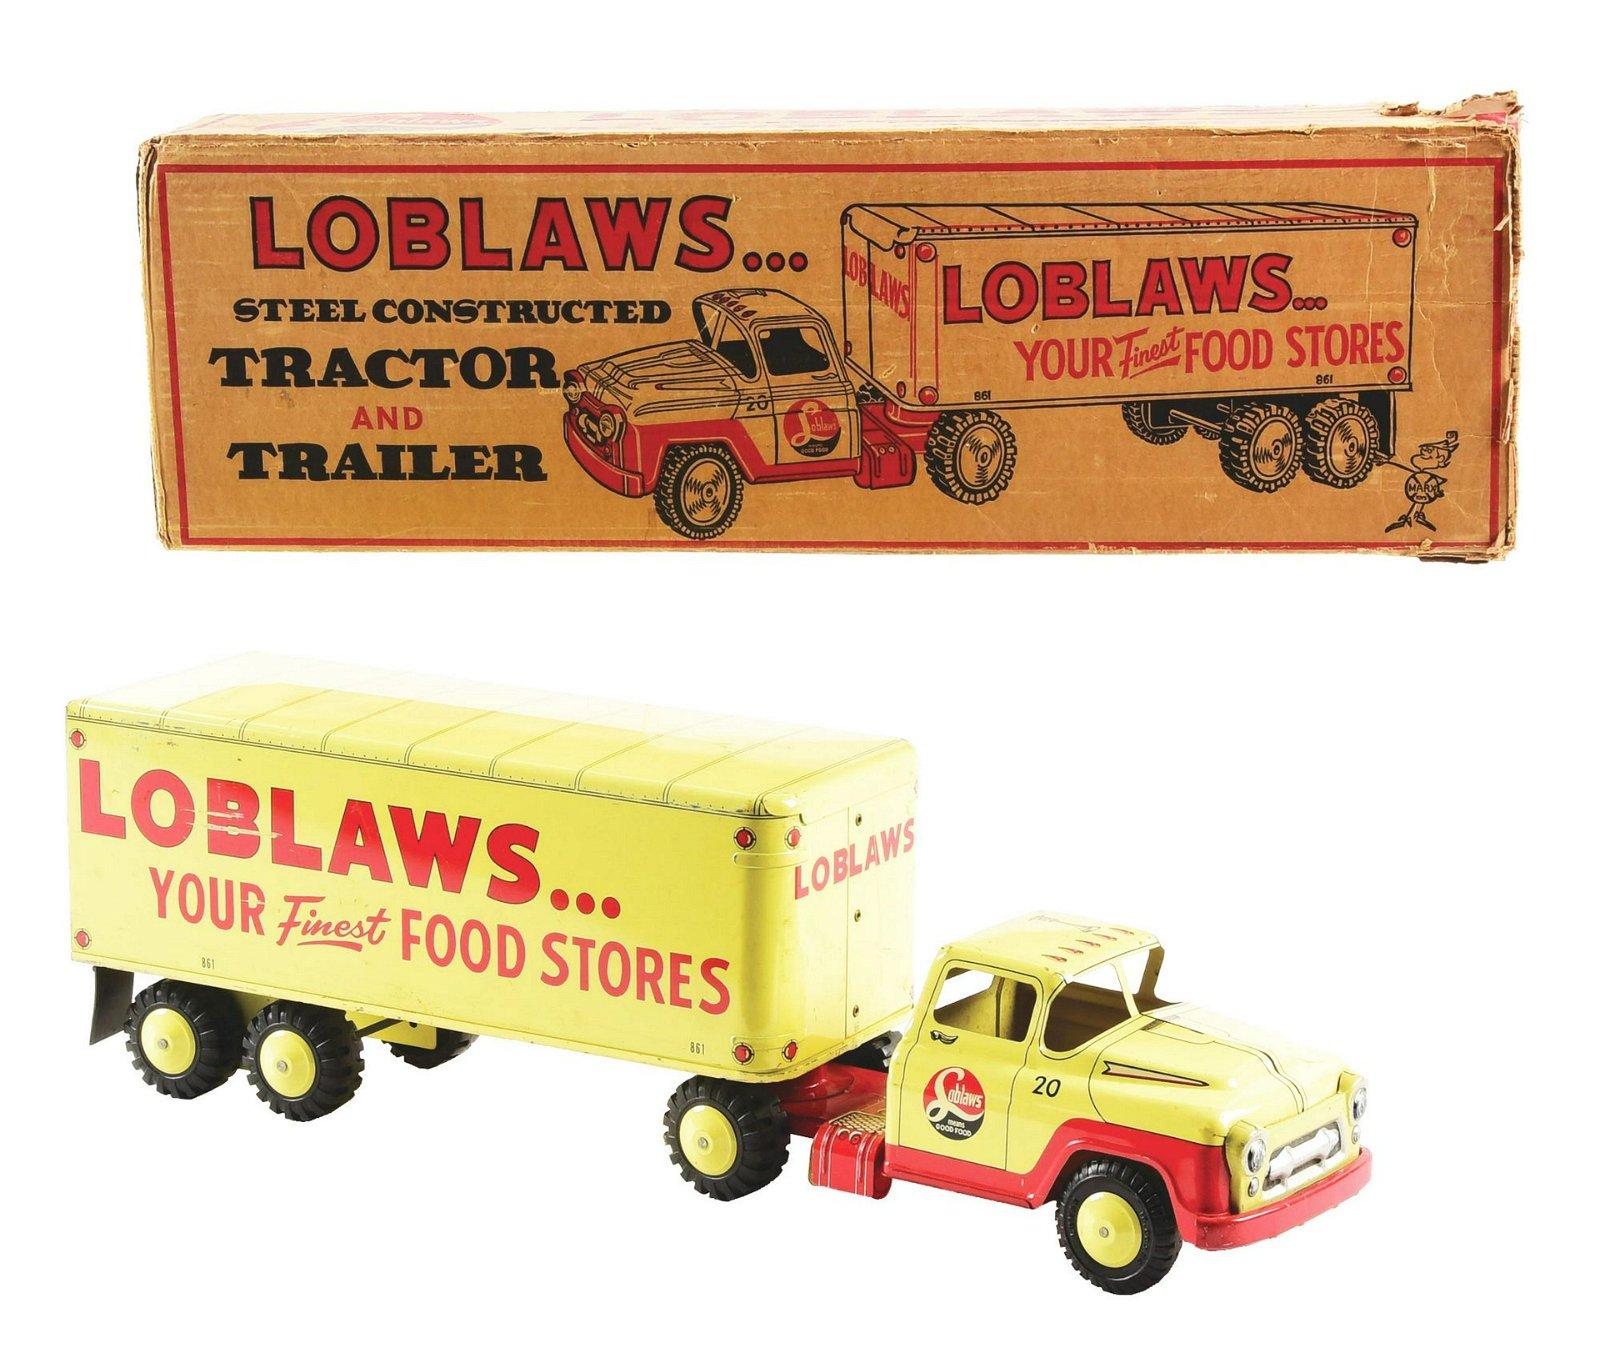 Pressed Steel Marx Loblaws Tractor & Trailer Box Truck.